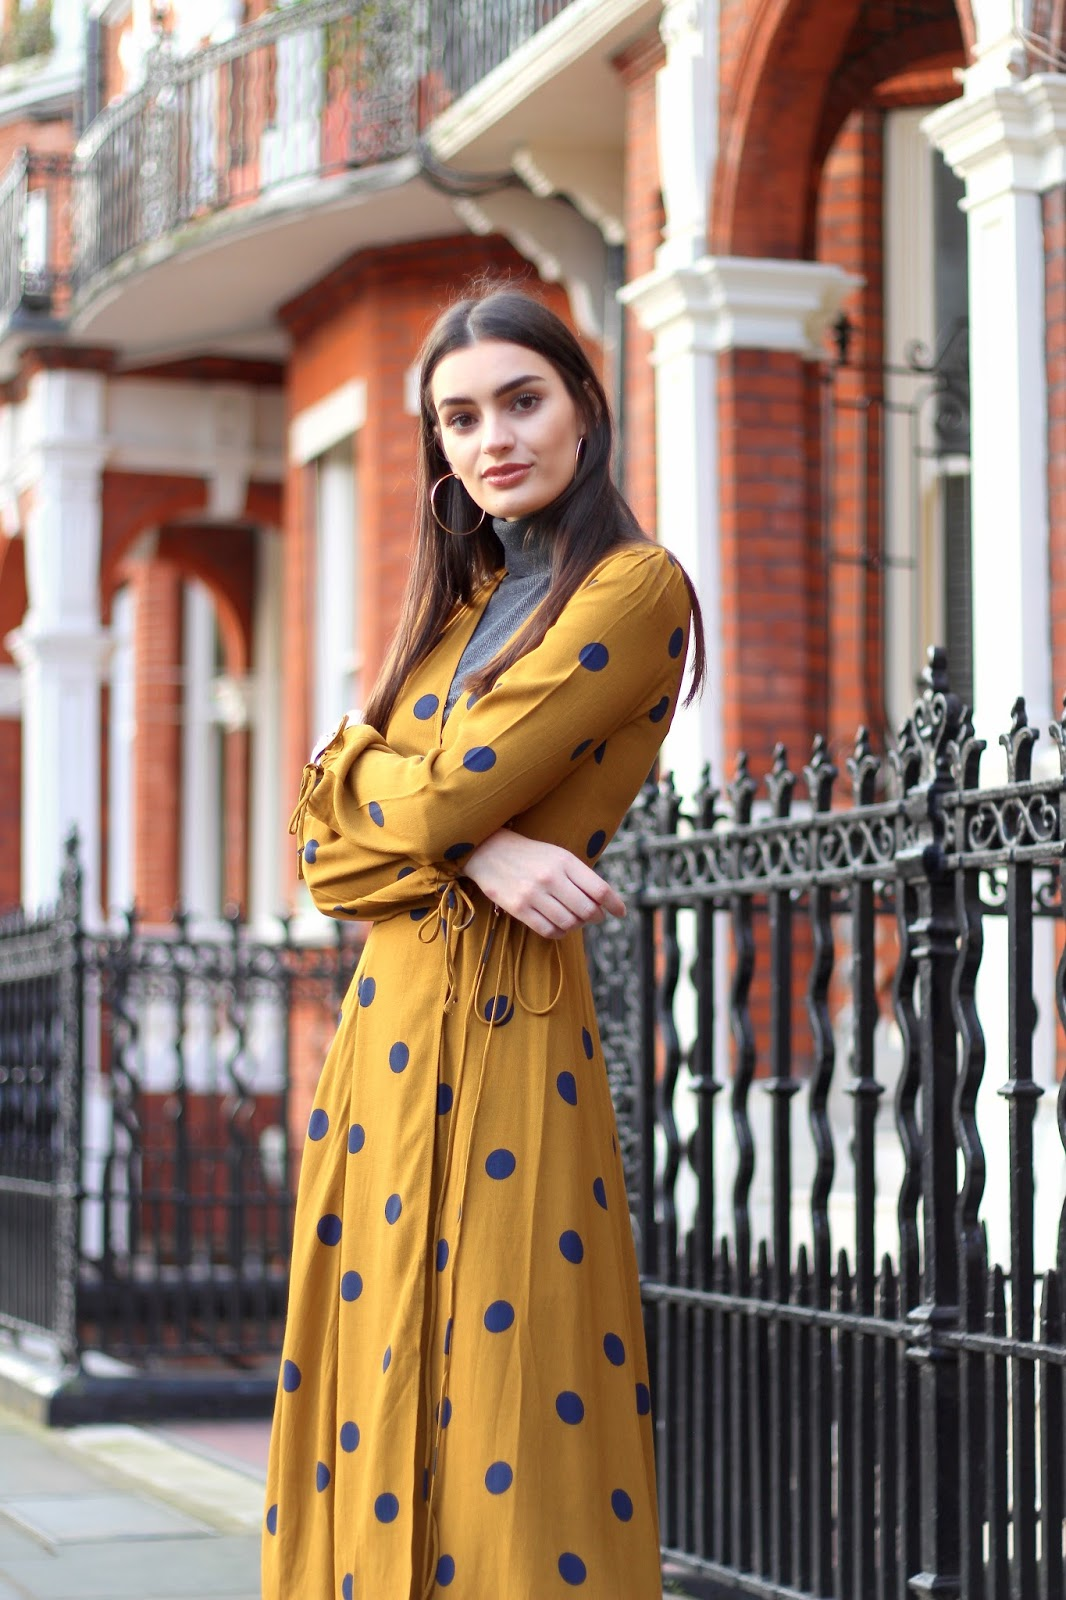 peexo fashion blogger london personal style